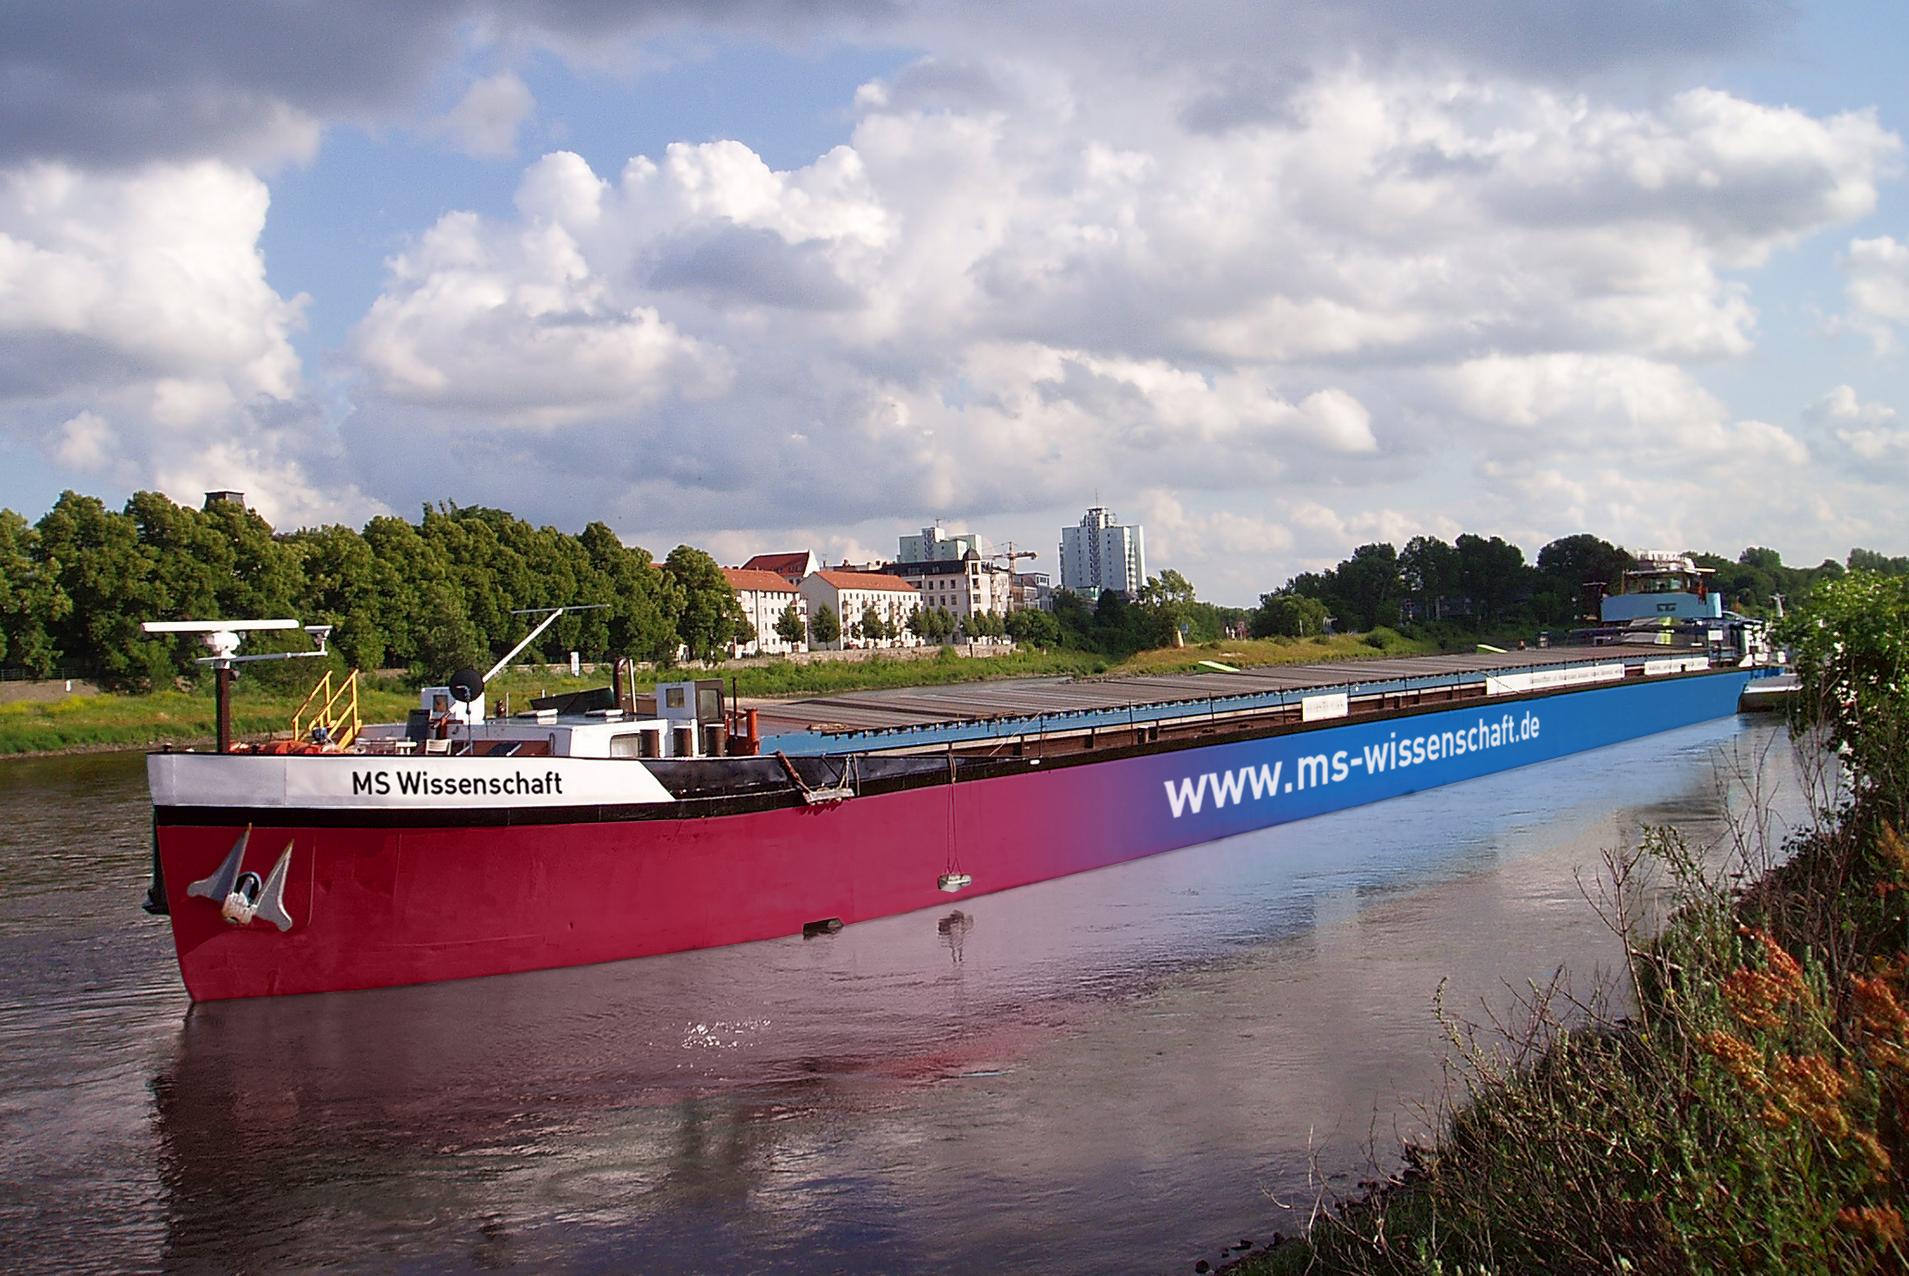 MS Wissenschaft legt im Dortmunder Hafen an